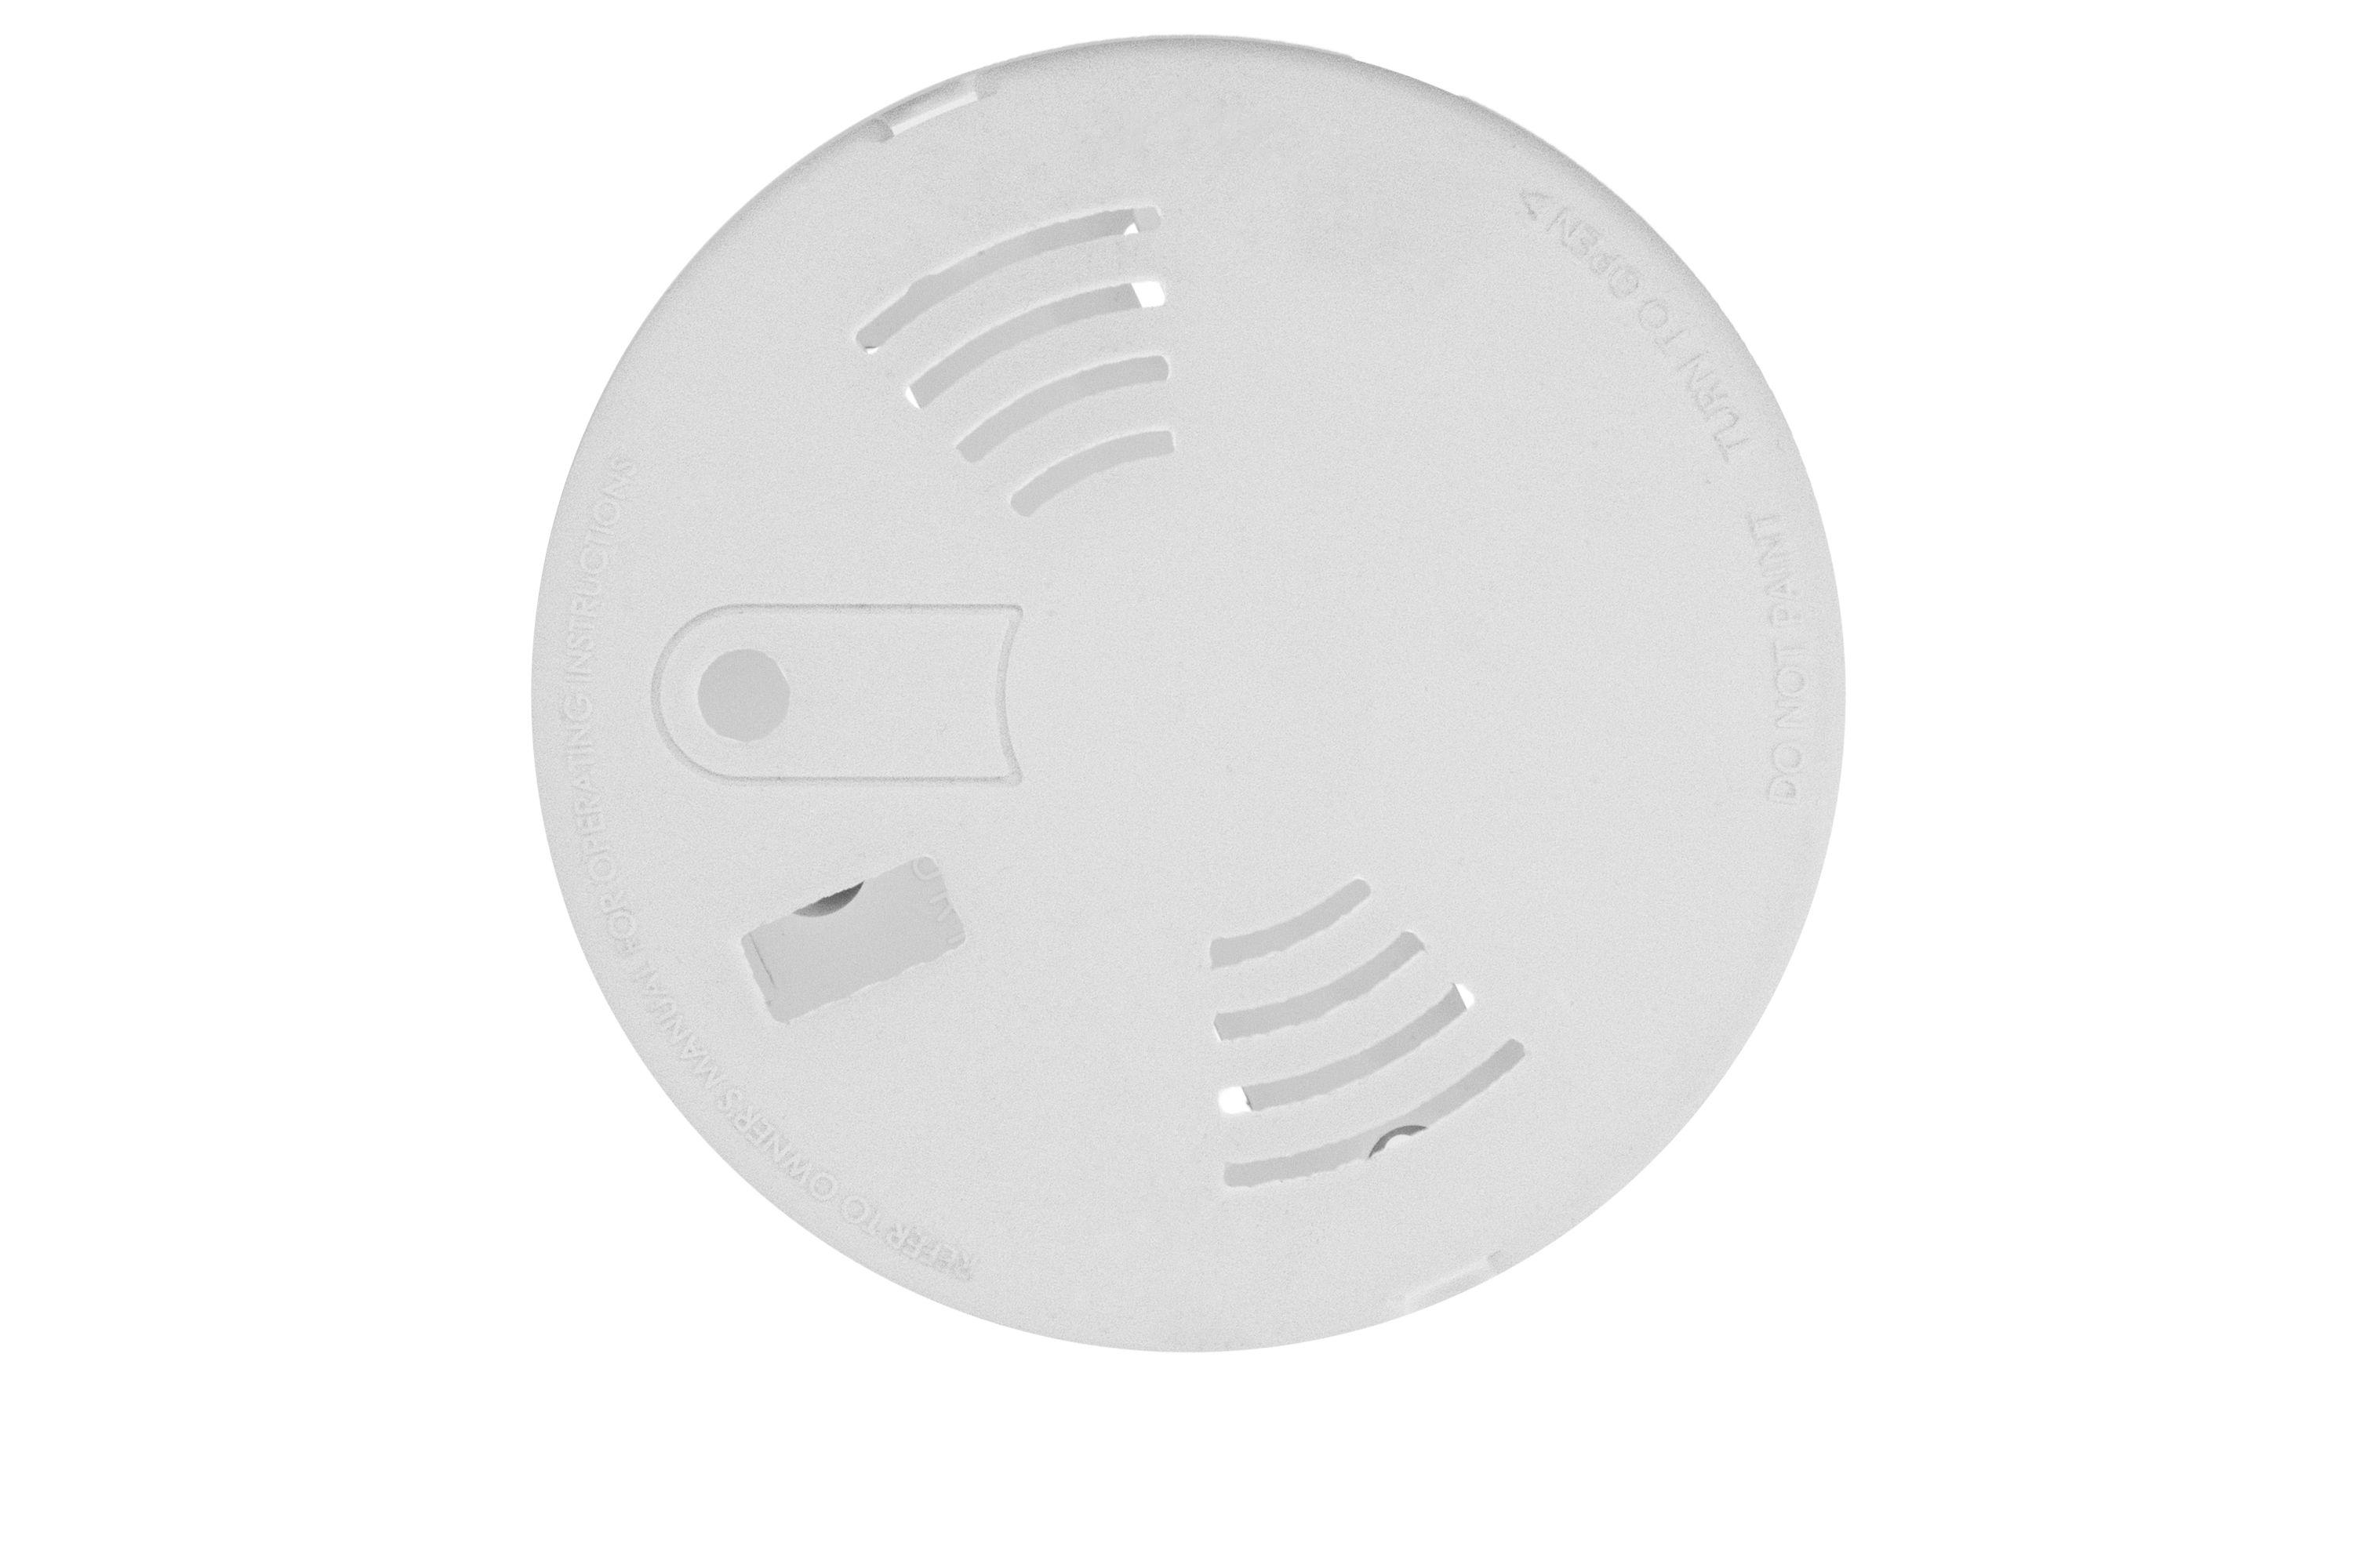 Camscura smoke detector enclosure spygear smoke